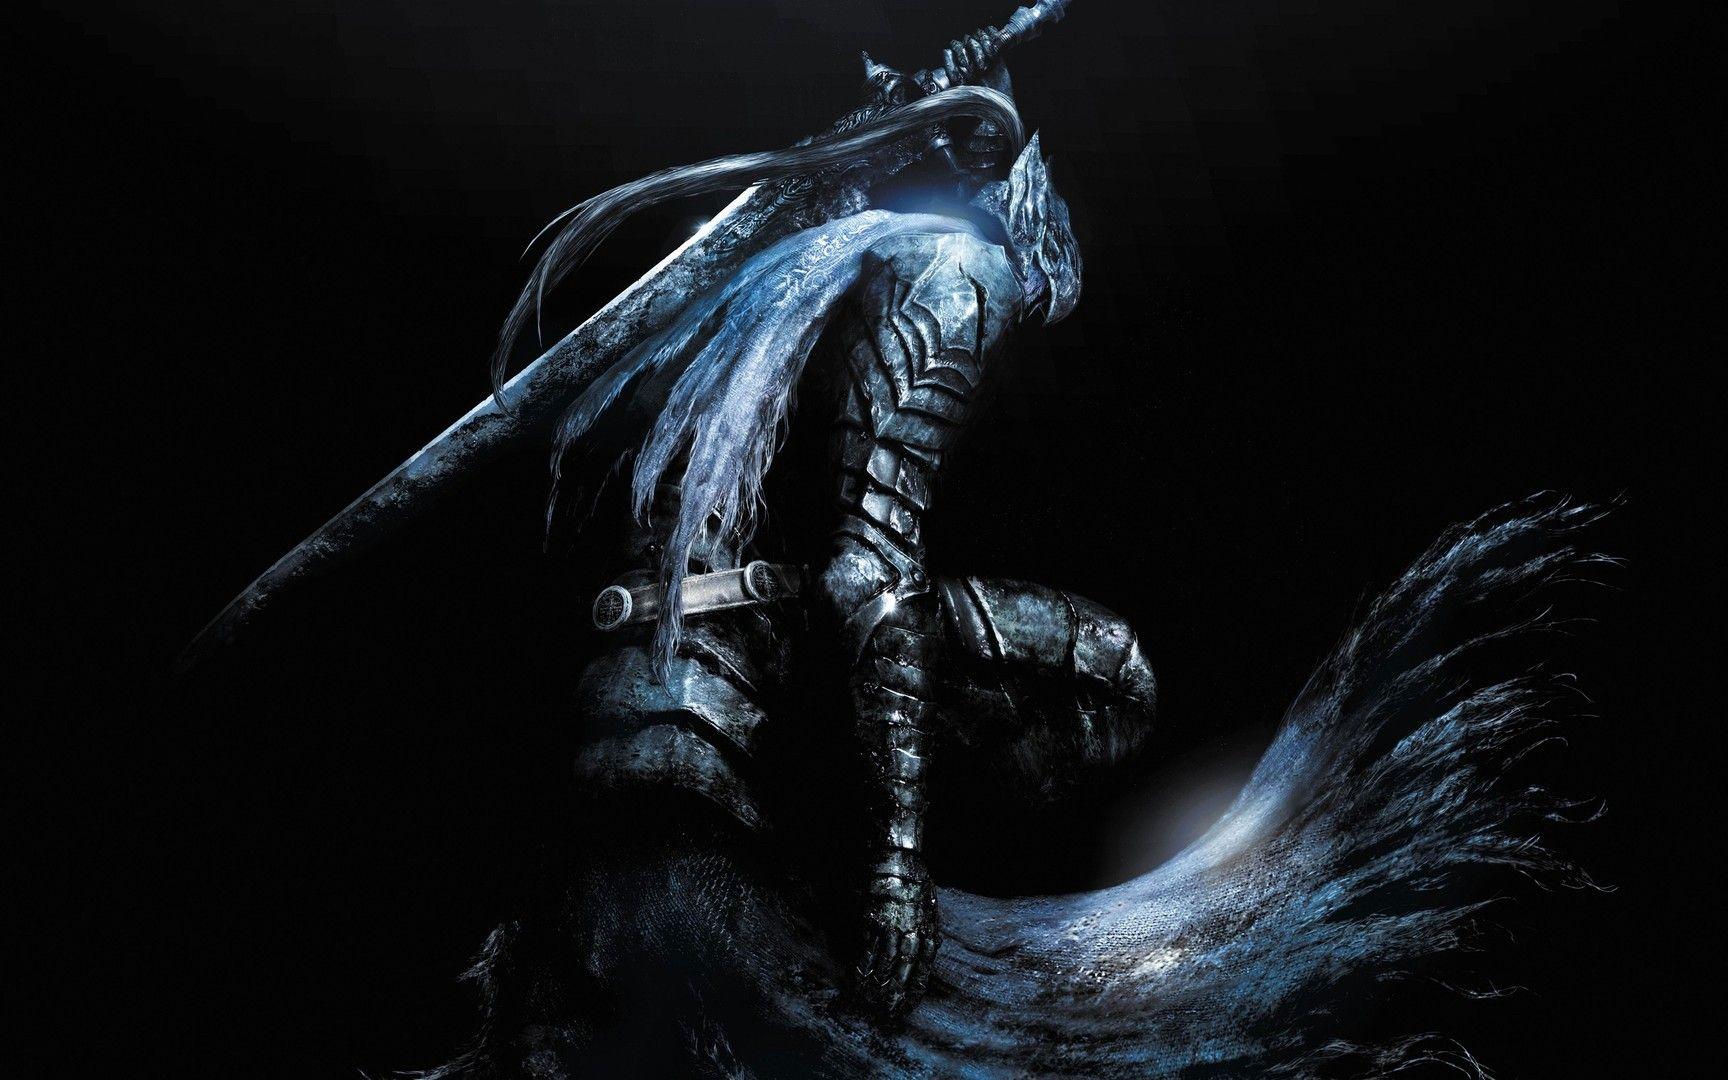 Knight Artorias Dark Souls Hd Formidable Wallpaper Free En